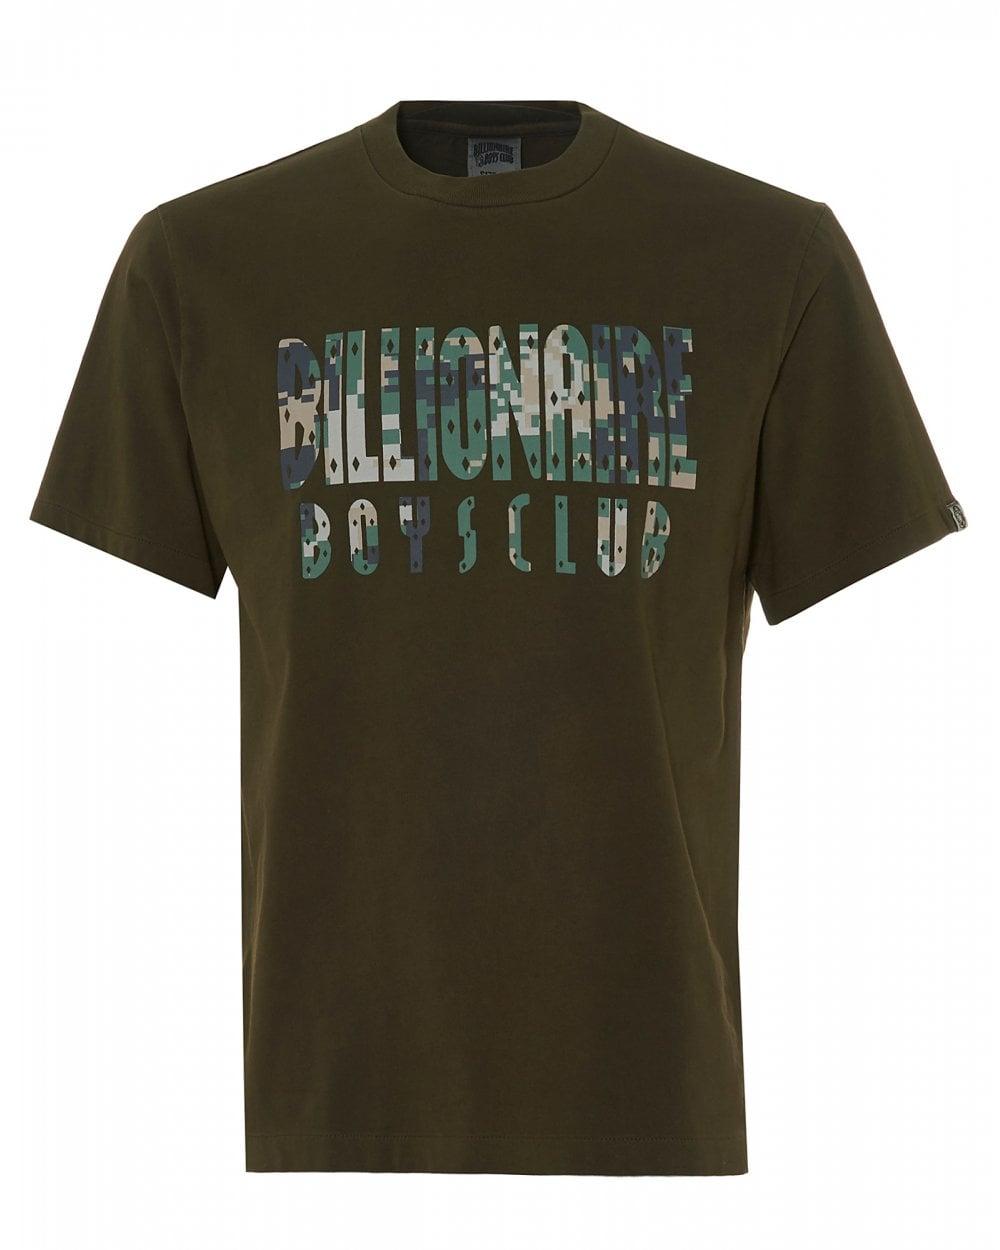 6bce48bcb Billionaire Boys Club Mens Overdye Digi Camo T-Shirt, Olive Green Tee